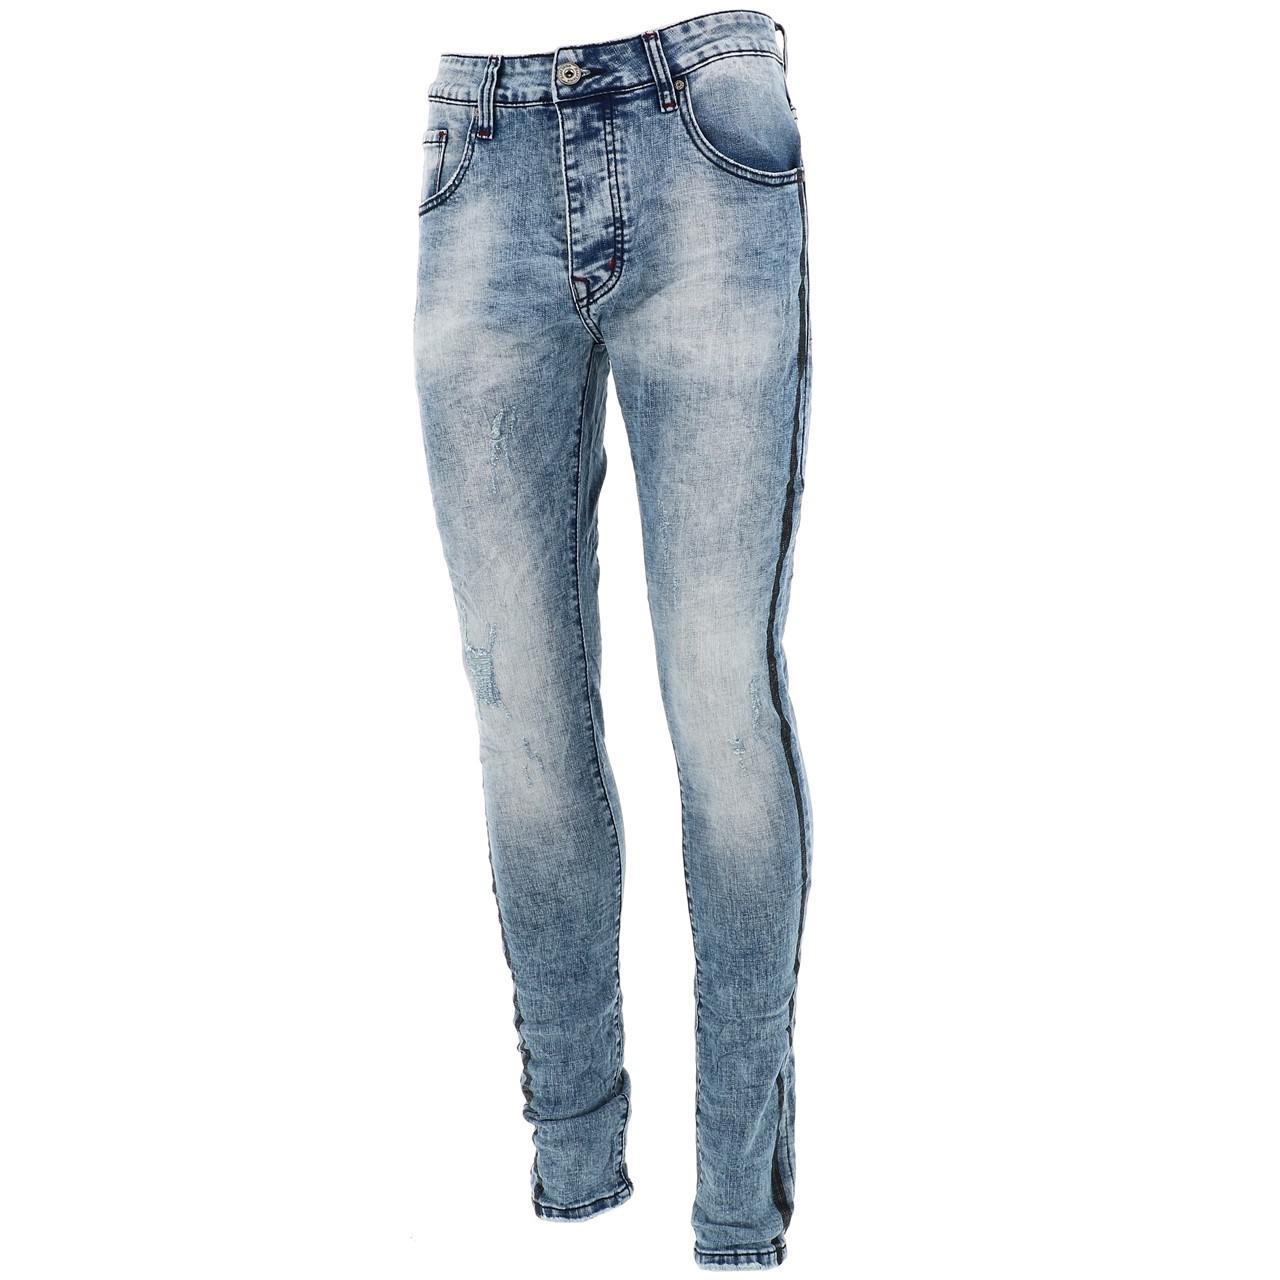 Jeans-Pants-Slim-Terance-Koll-Oscar-Denim-Jeans-Skinny-Blue-28526-New